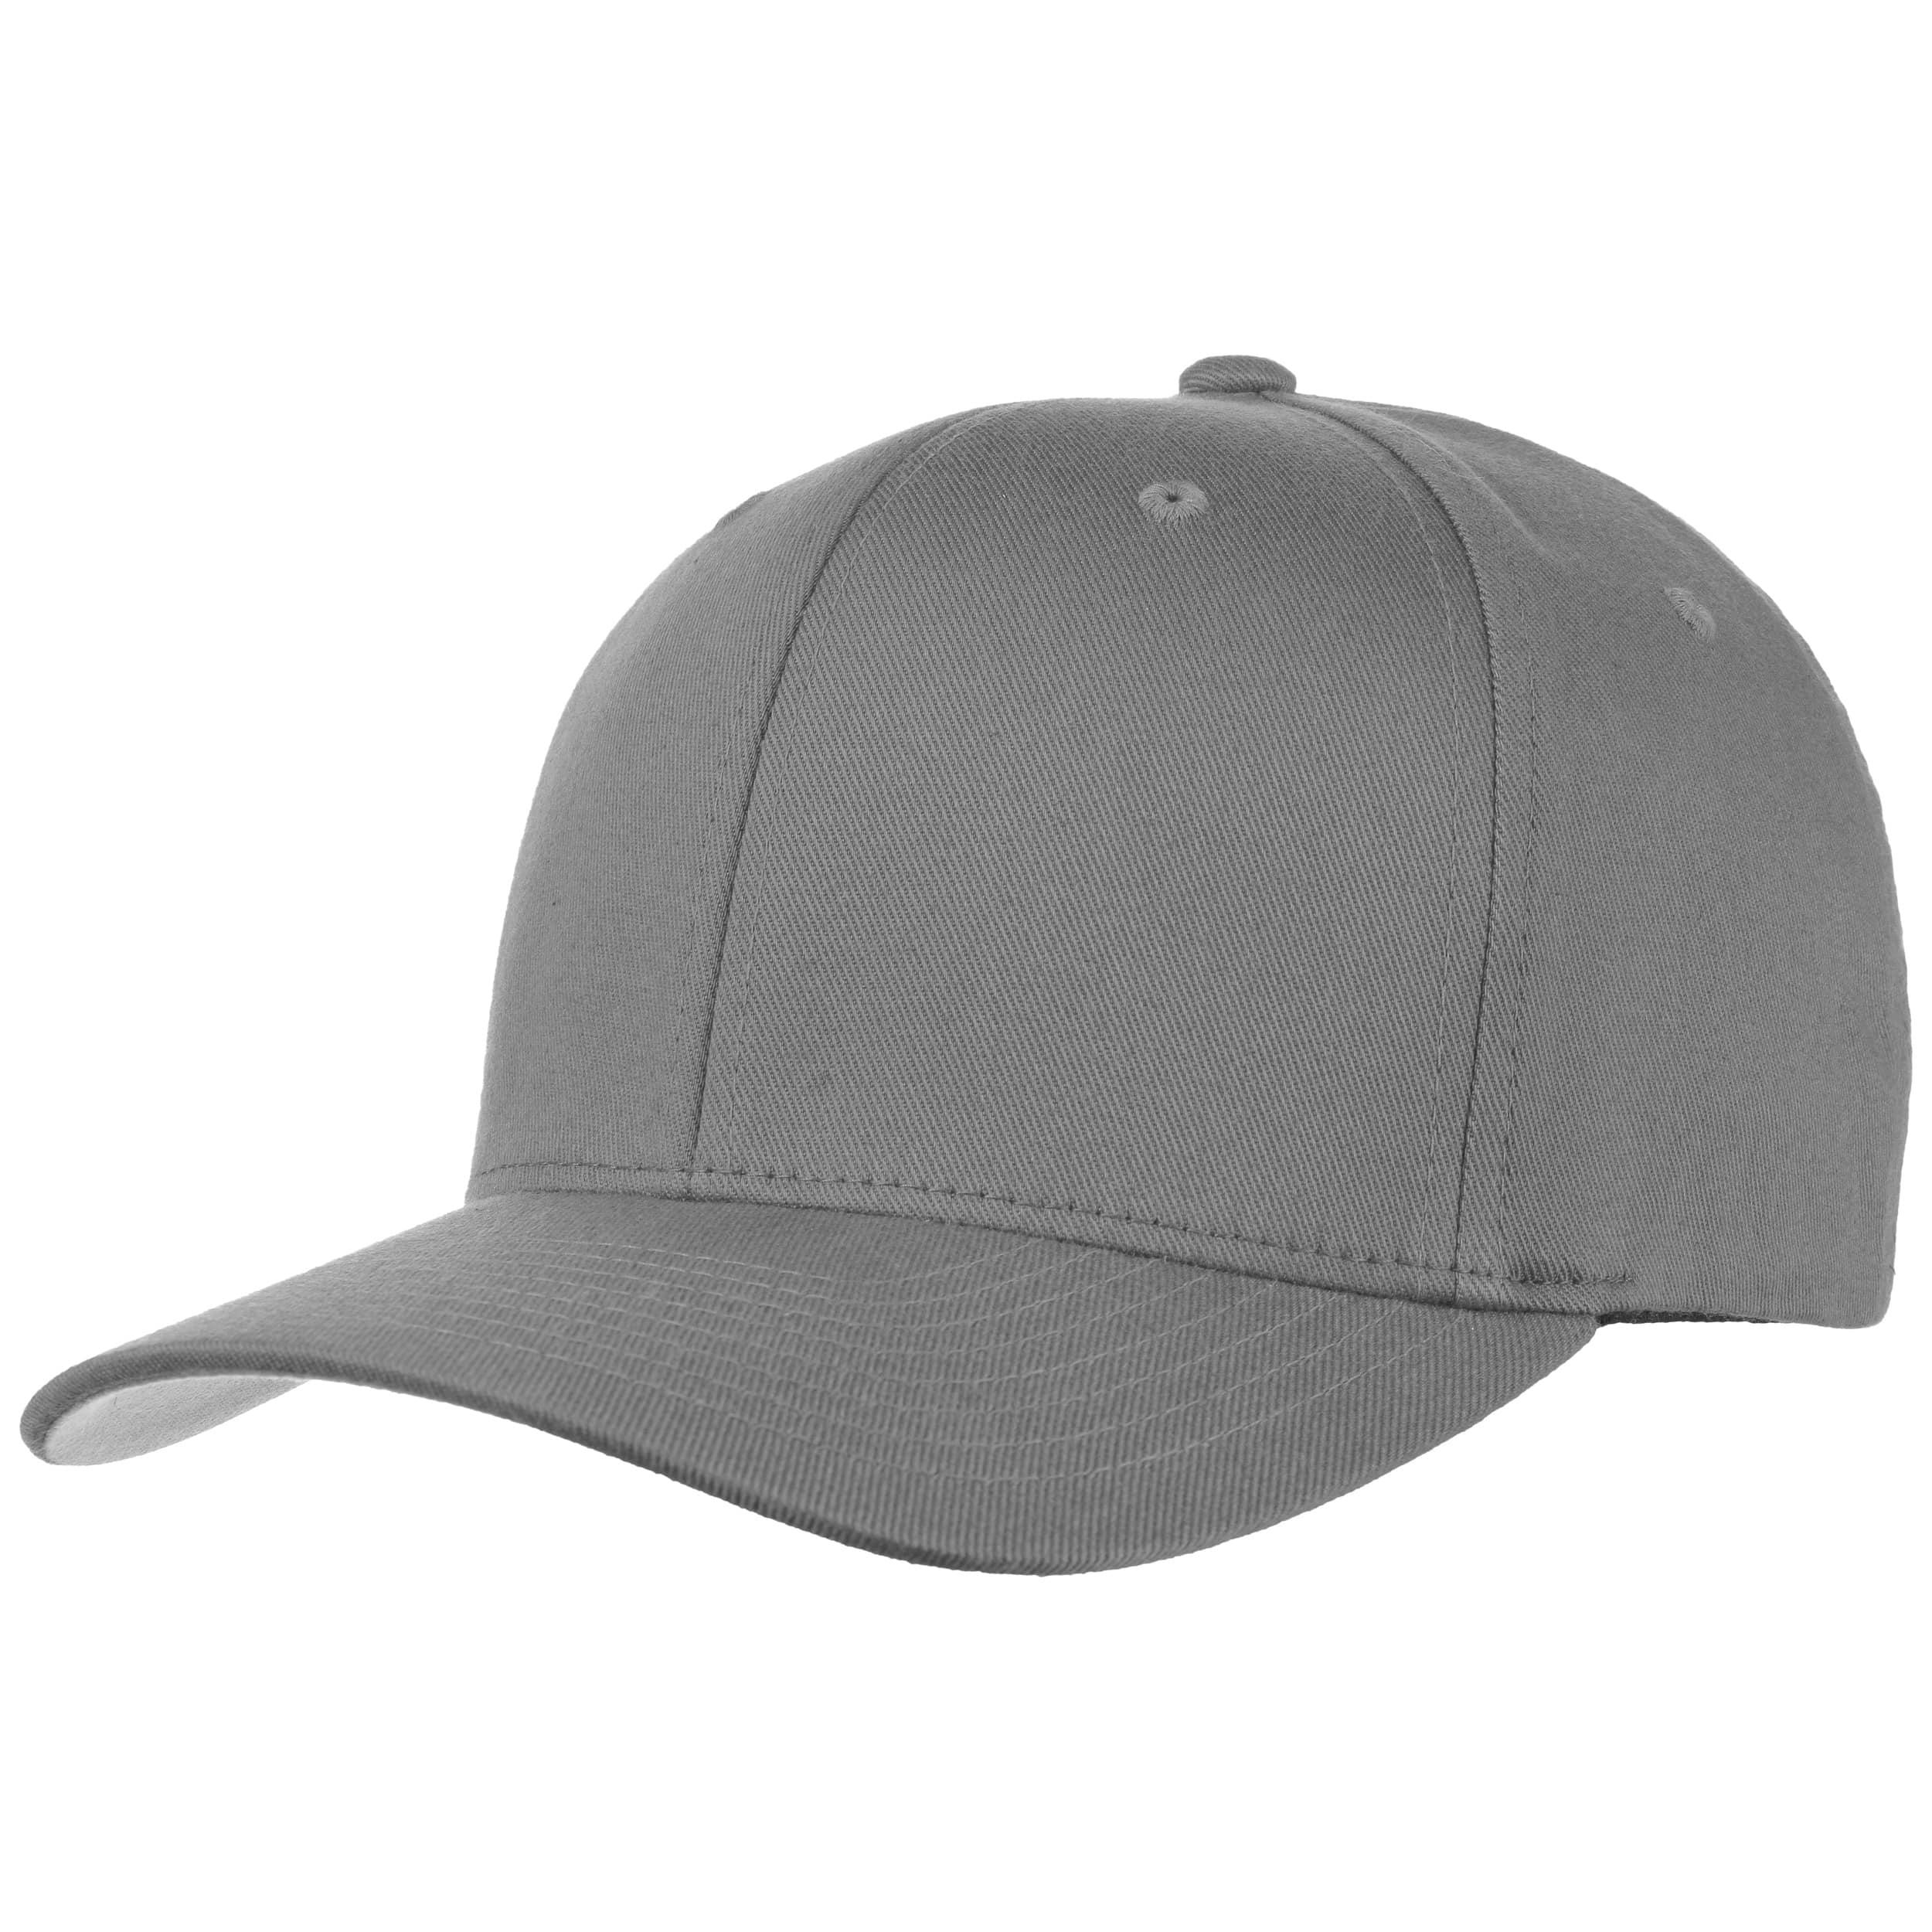 Gorra Flexfit Spandex - Gorras - sombreroshop.es 8c6ac8e5d1f